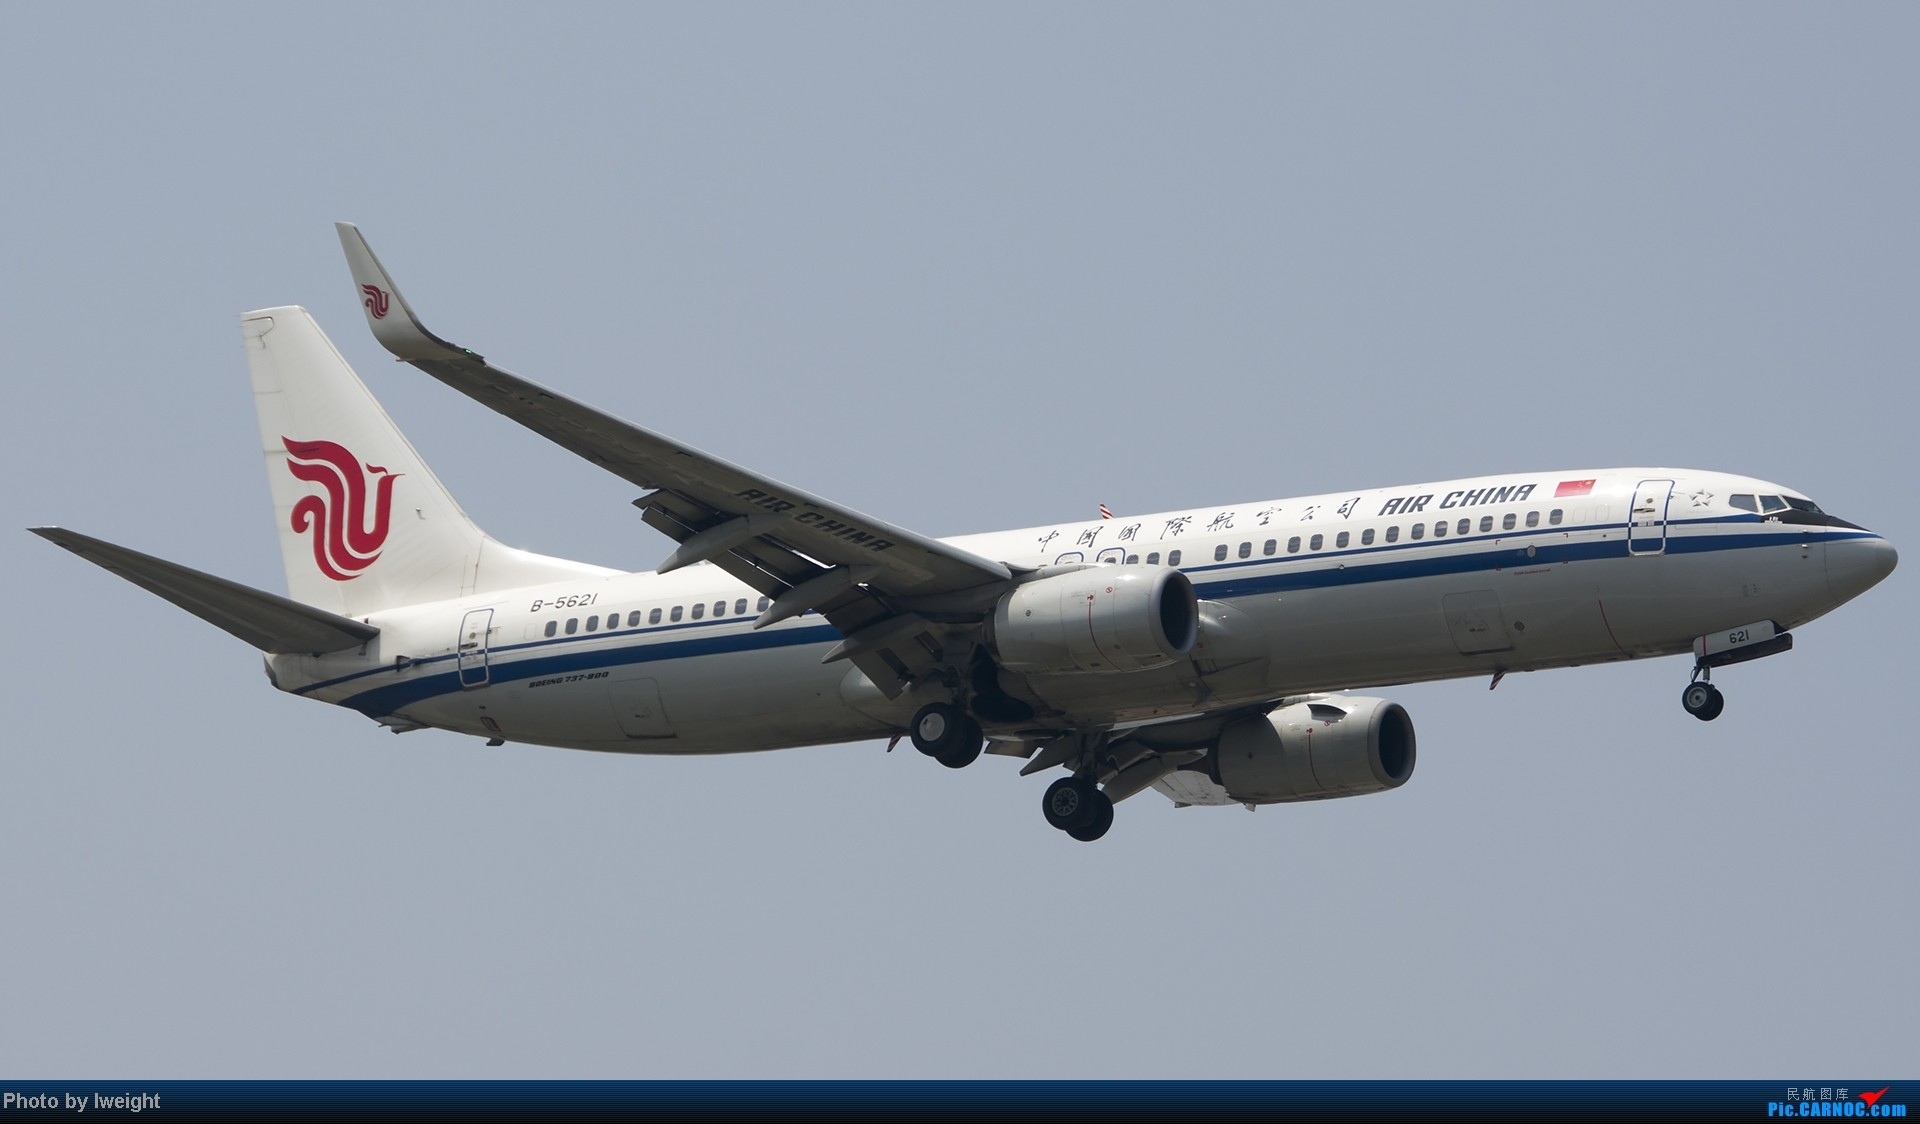 Re:[原创]休假无聊,跑道边来拍机玩(晚点的ZestAir、换装的B6100和刚交付的B2738等) BOEING 737-800 B-5621 中国北京首都机场